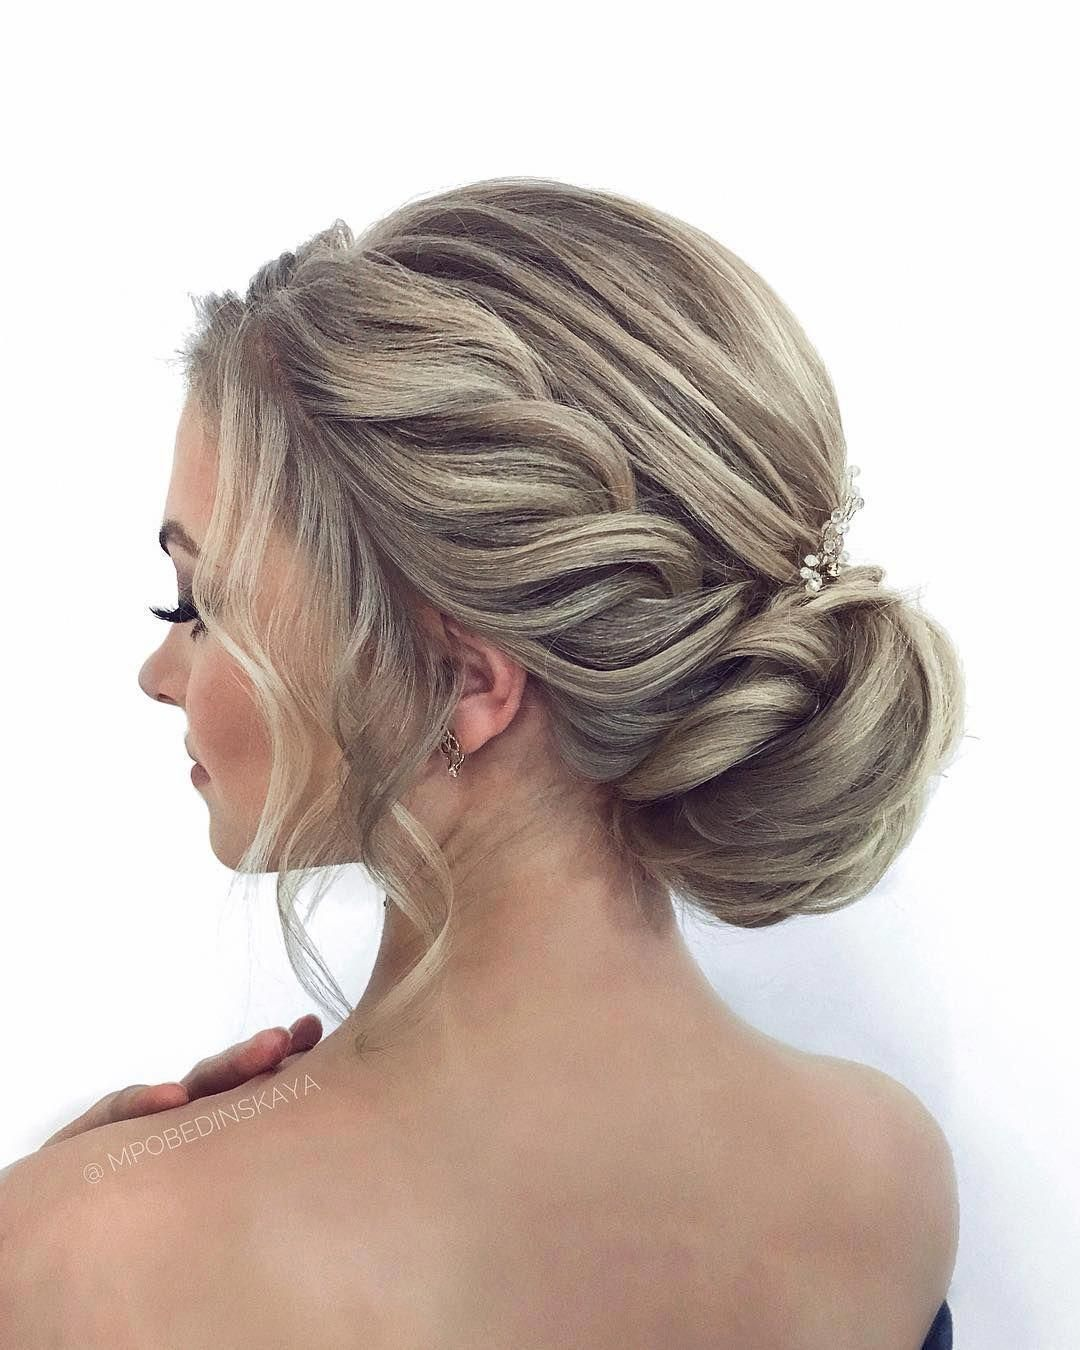 Church Wedding Hairstyle